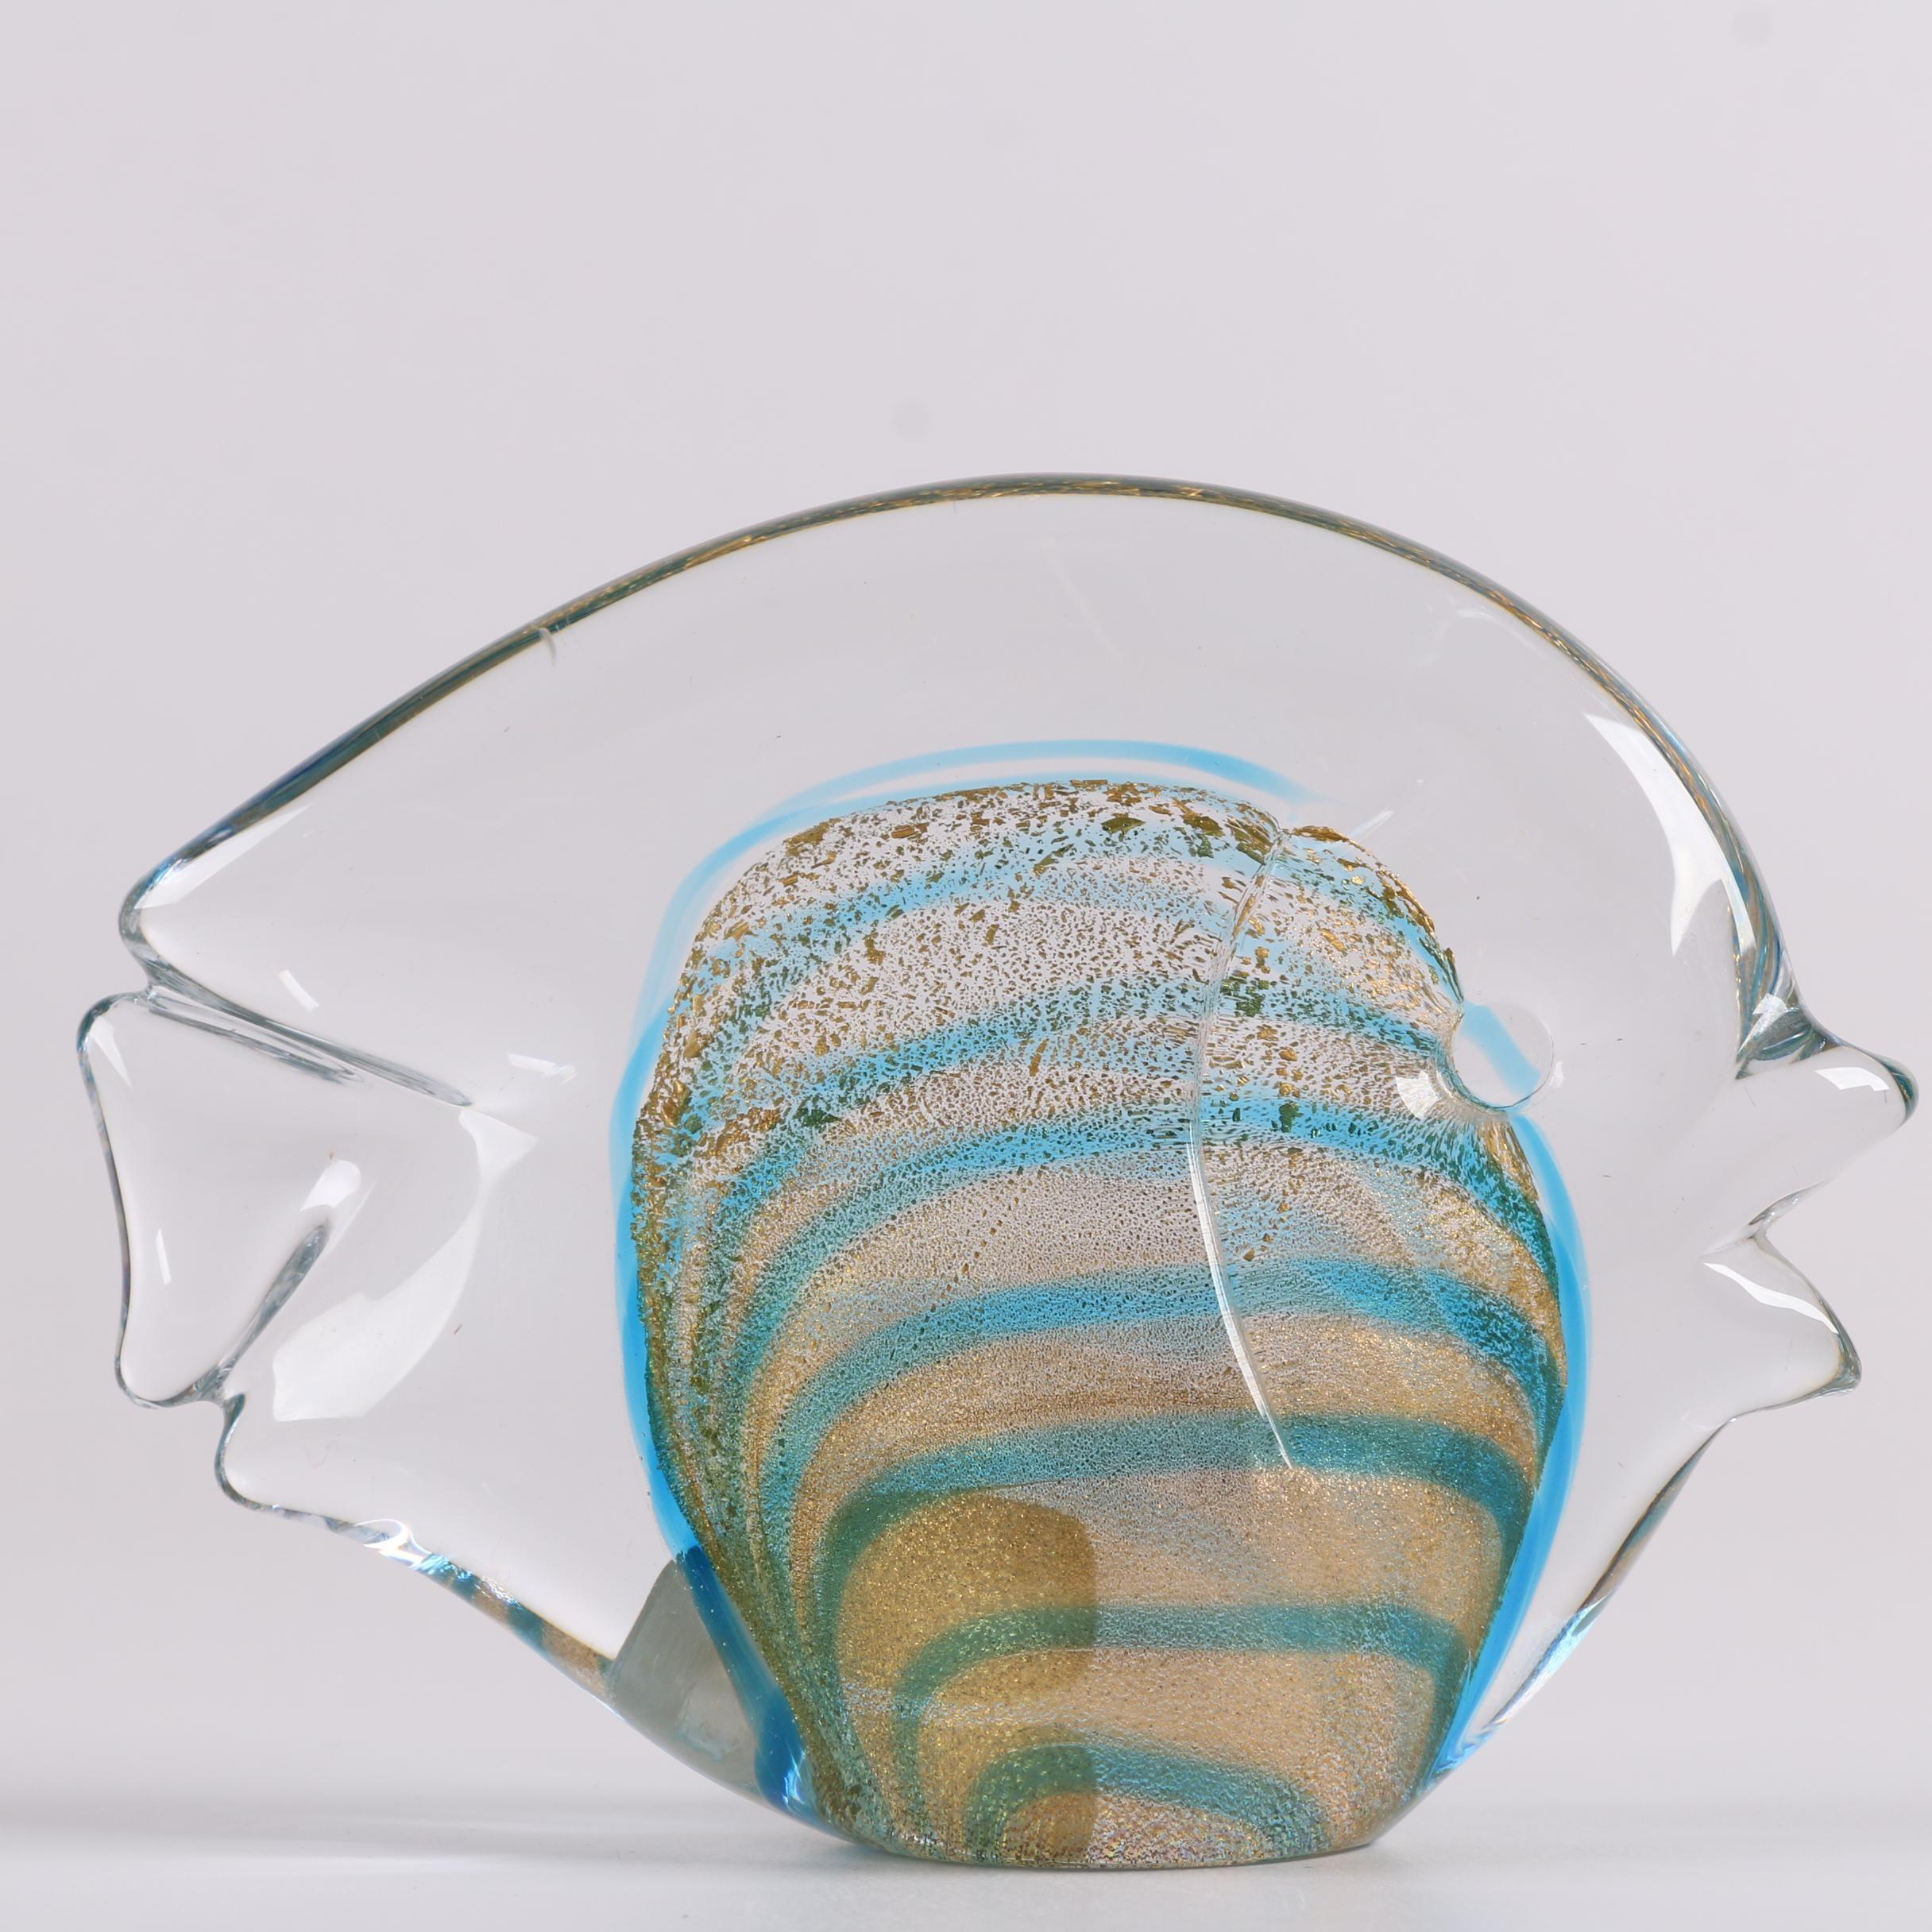 Italian Marcolin Art Crystal Avventurina Fish Figurine